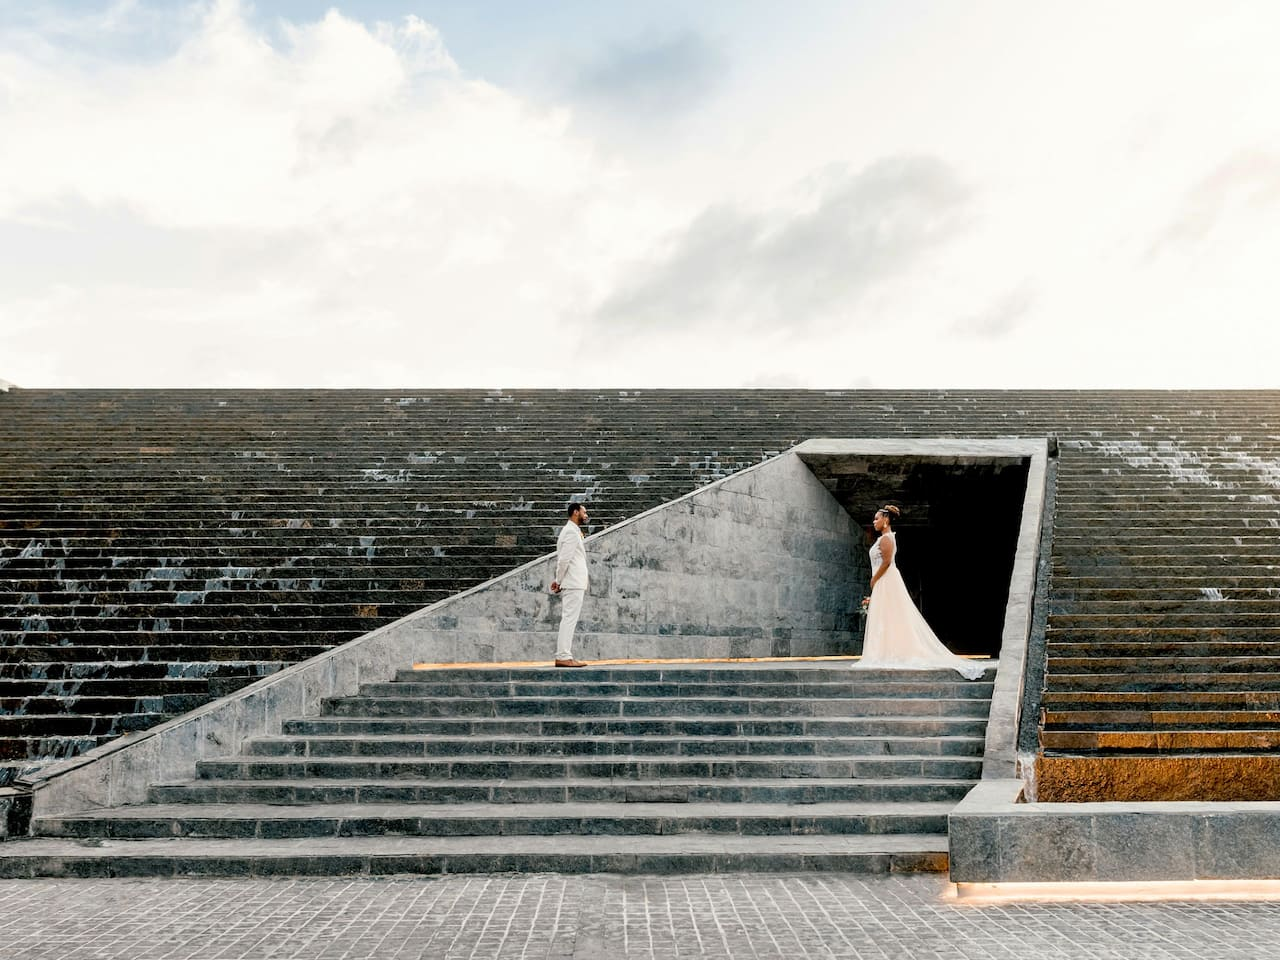 CUNPC_P0729 Summer Wedding The Pyramid